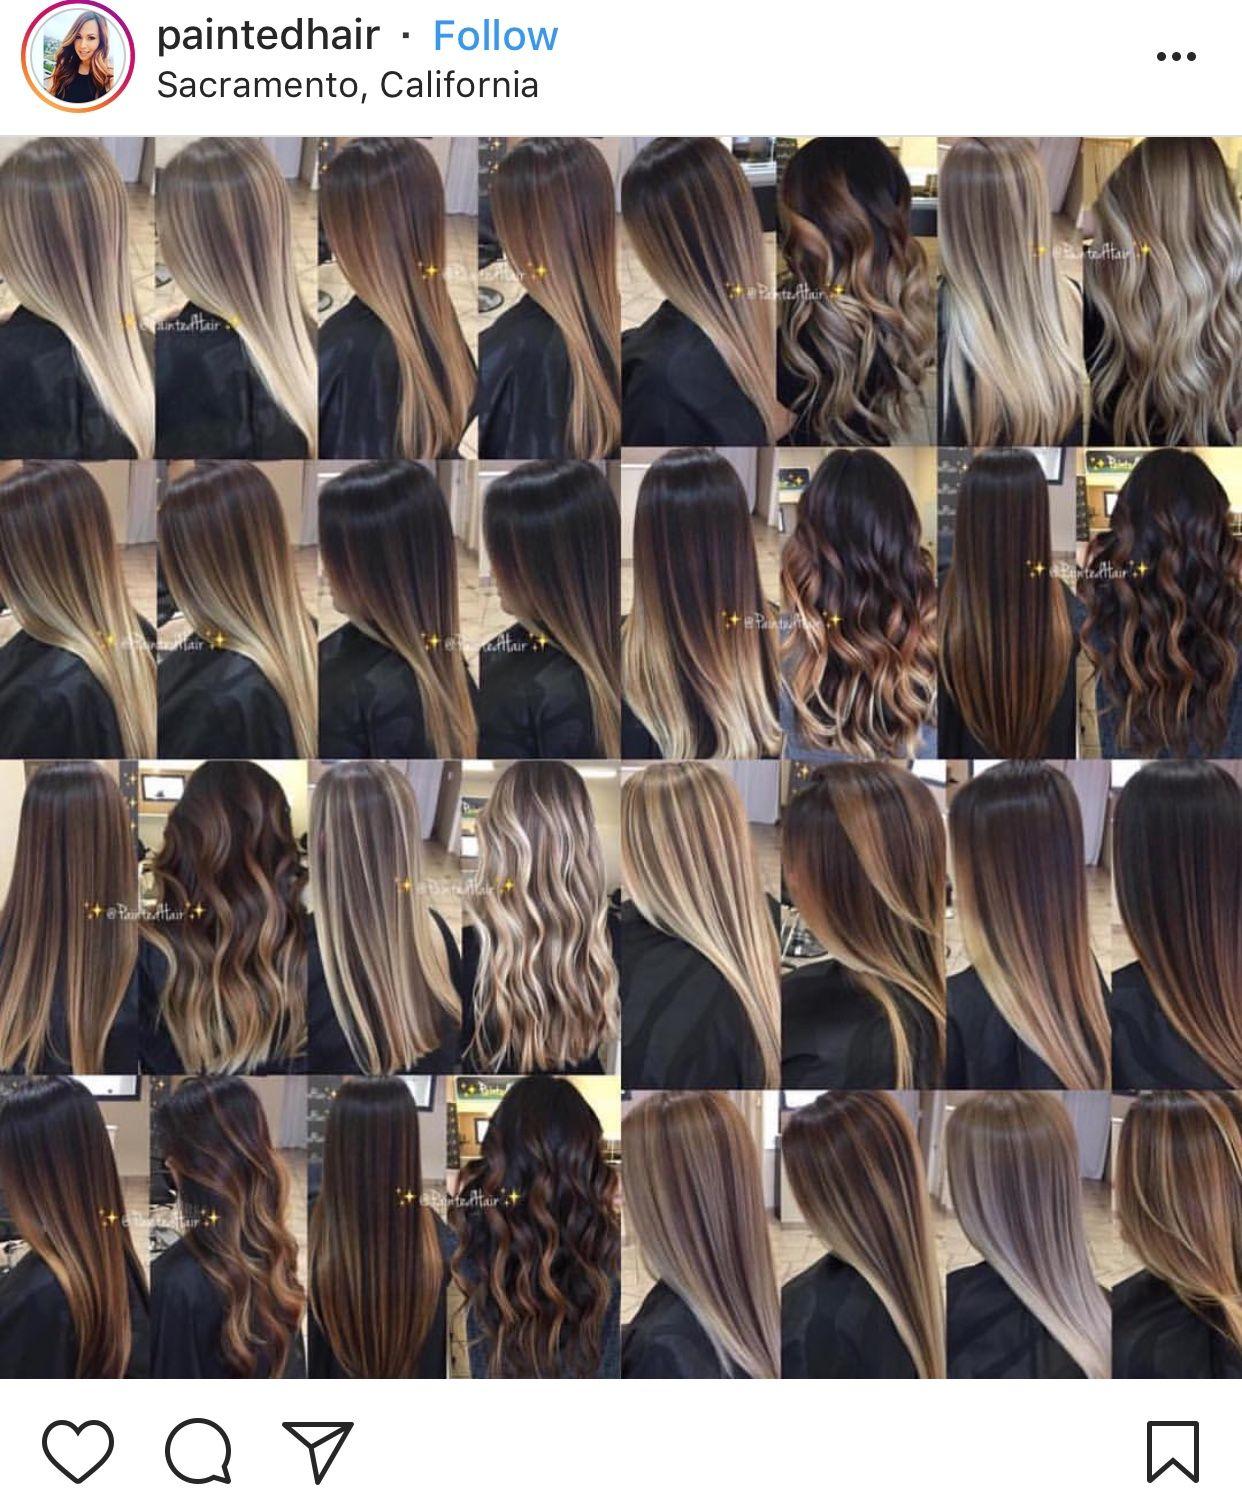 Pin By Kaitlynn Drake On Hair Ideas In 2019 Pinterest Hair